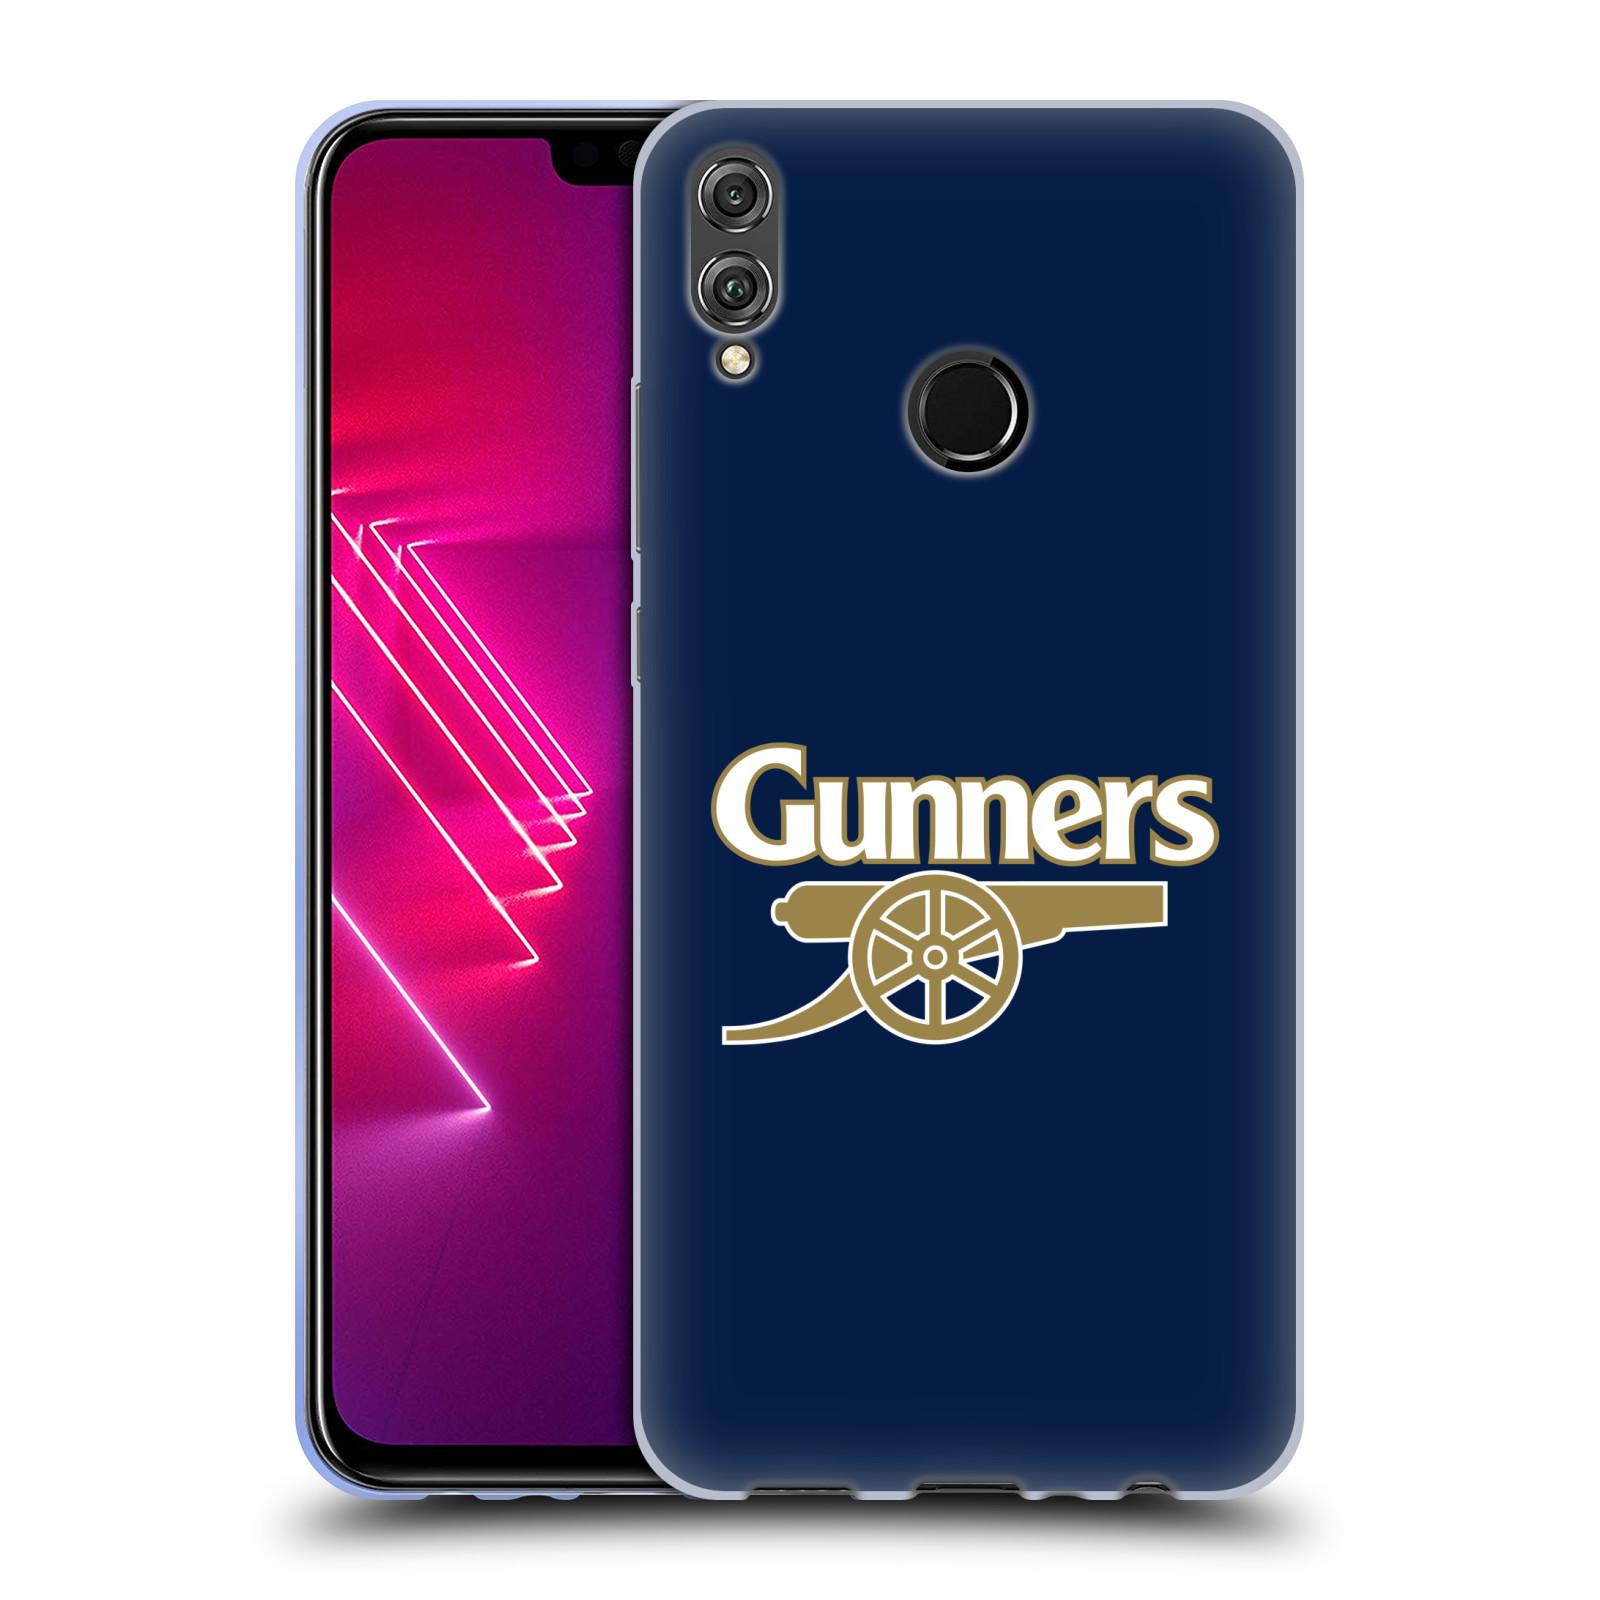 Silikonové pouzdro na mobil Honor 8X - Head Case - Arsenal FC - Gunners